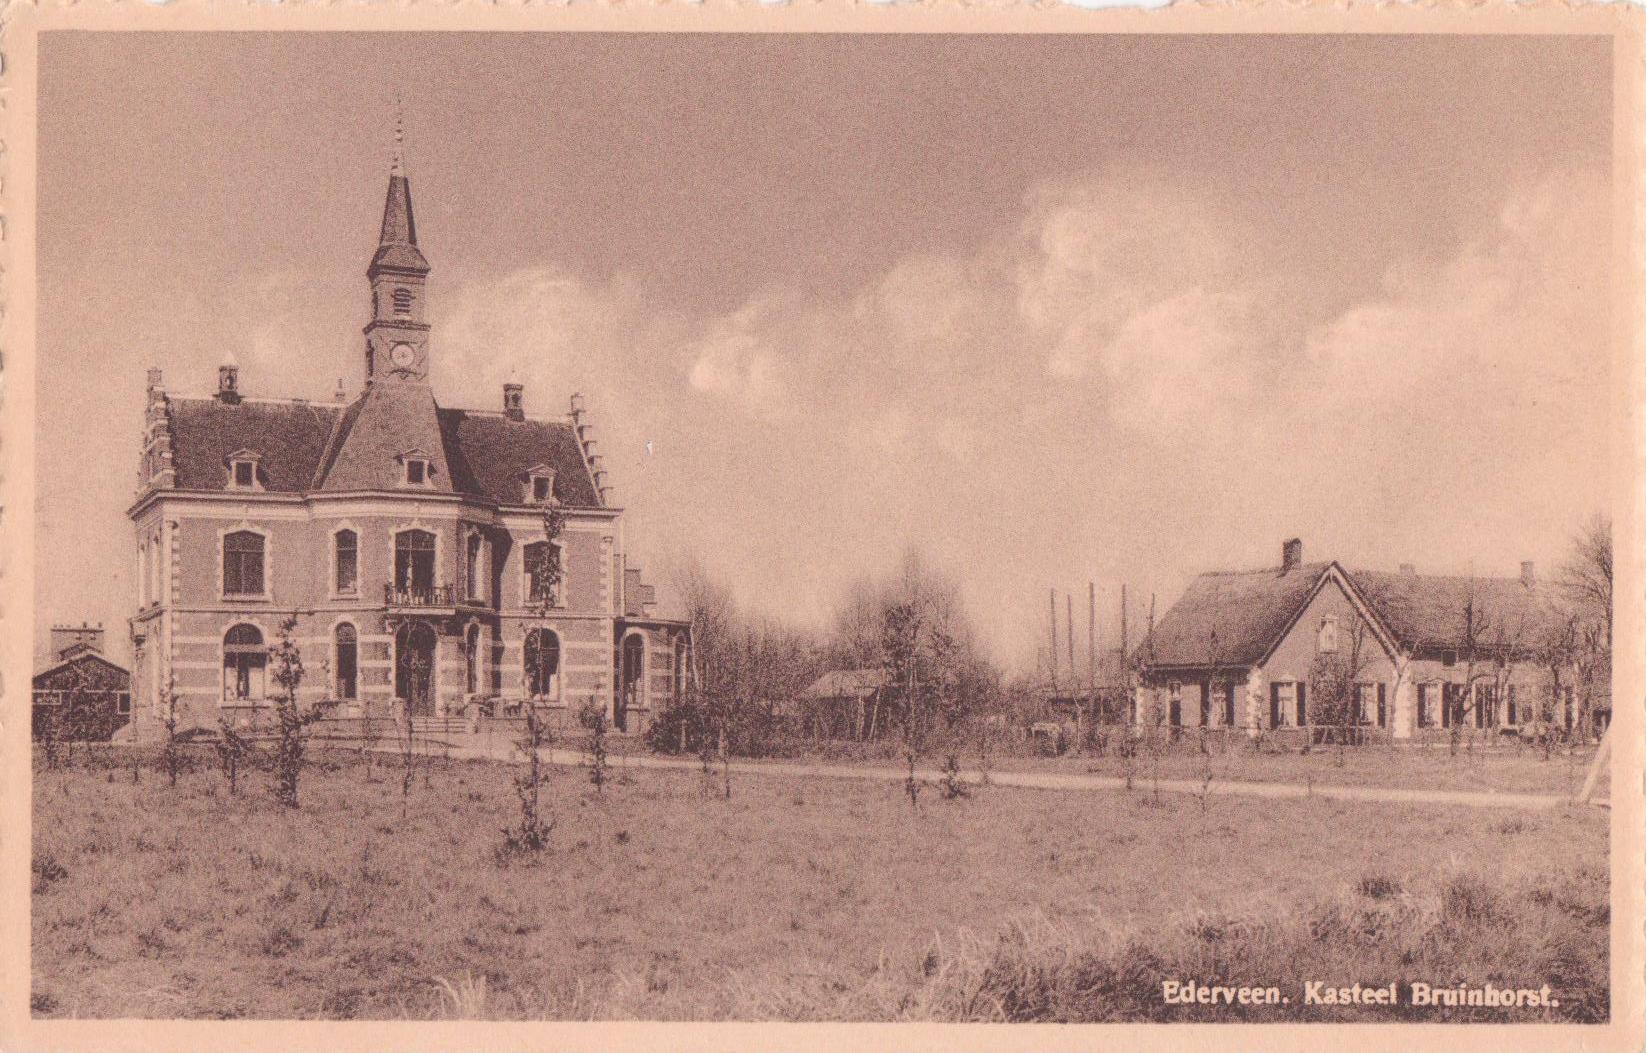 kasteel-bruinhorst-ederveen-2